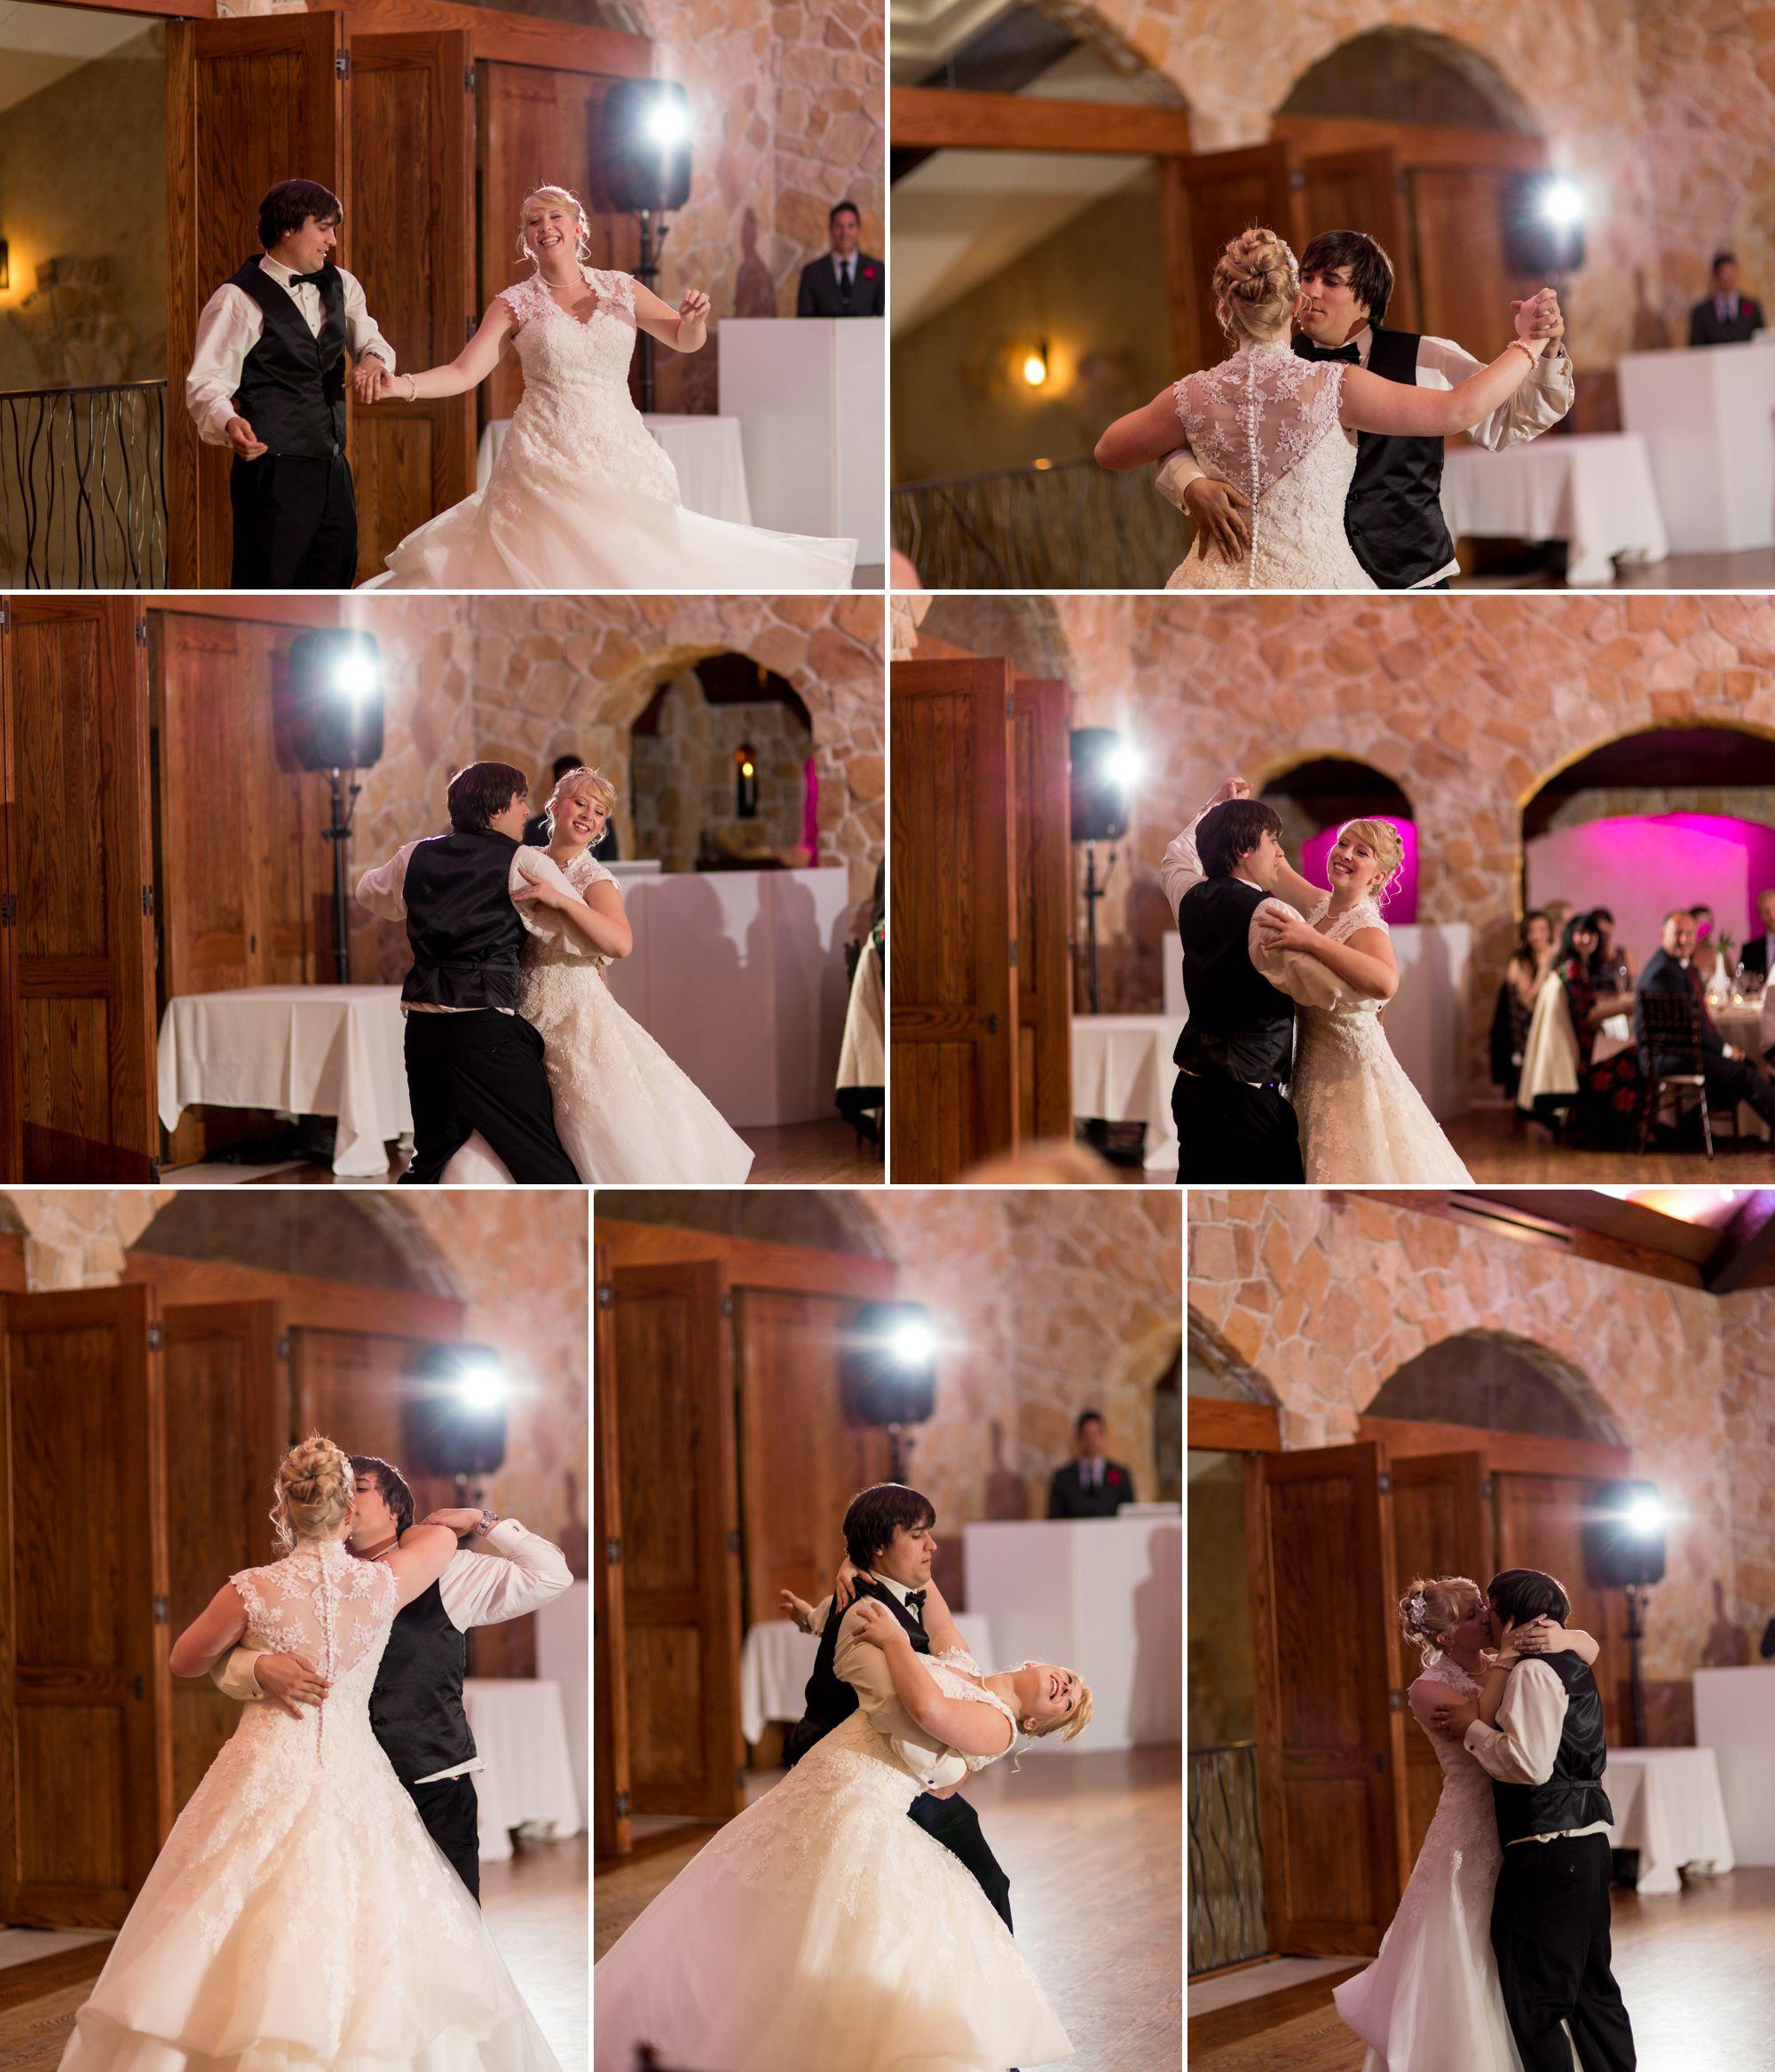 Choreographed first dance - Ballroom style!!